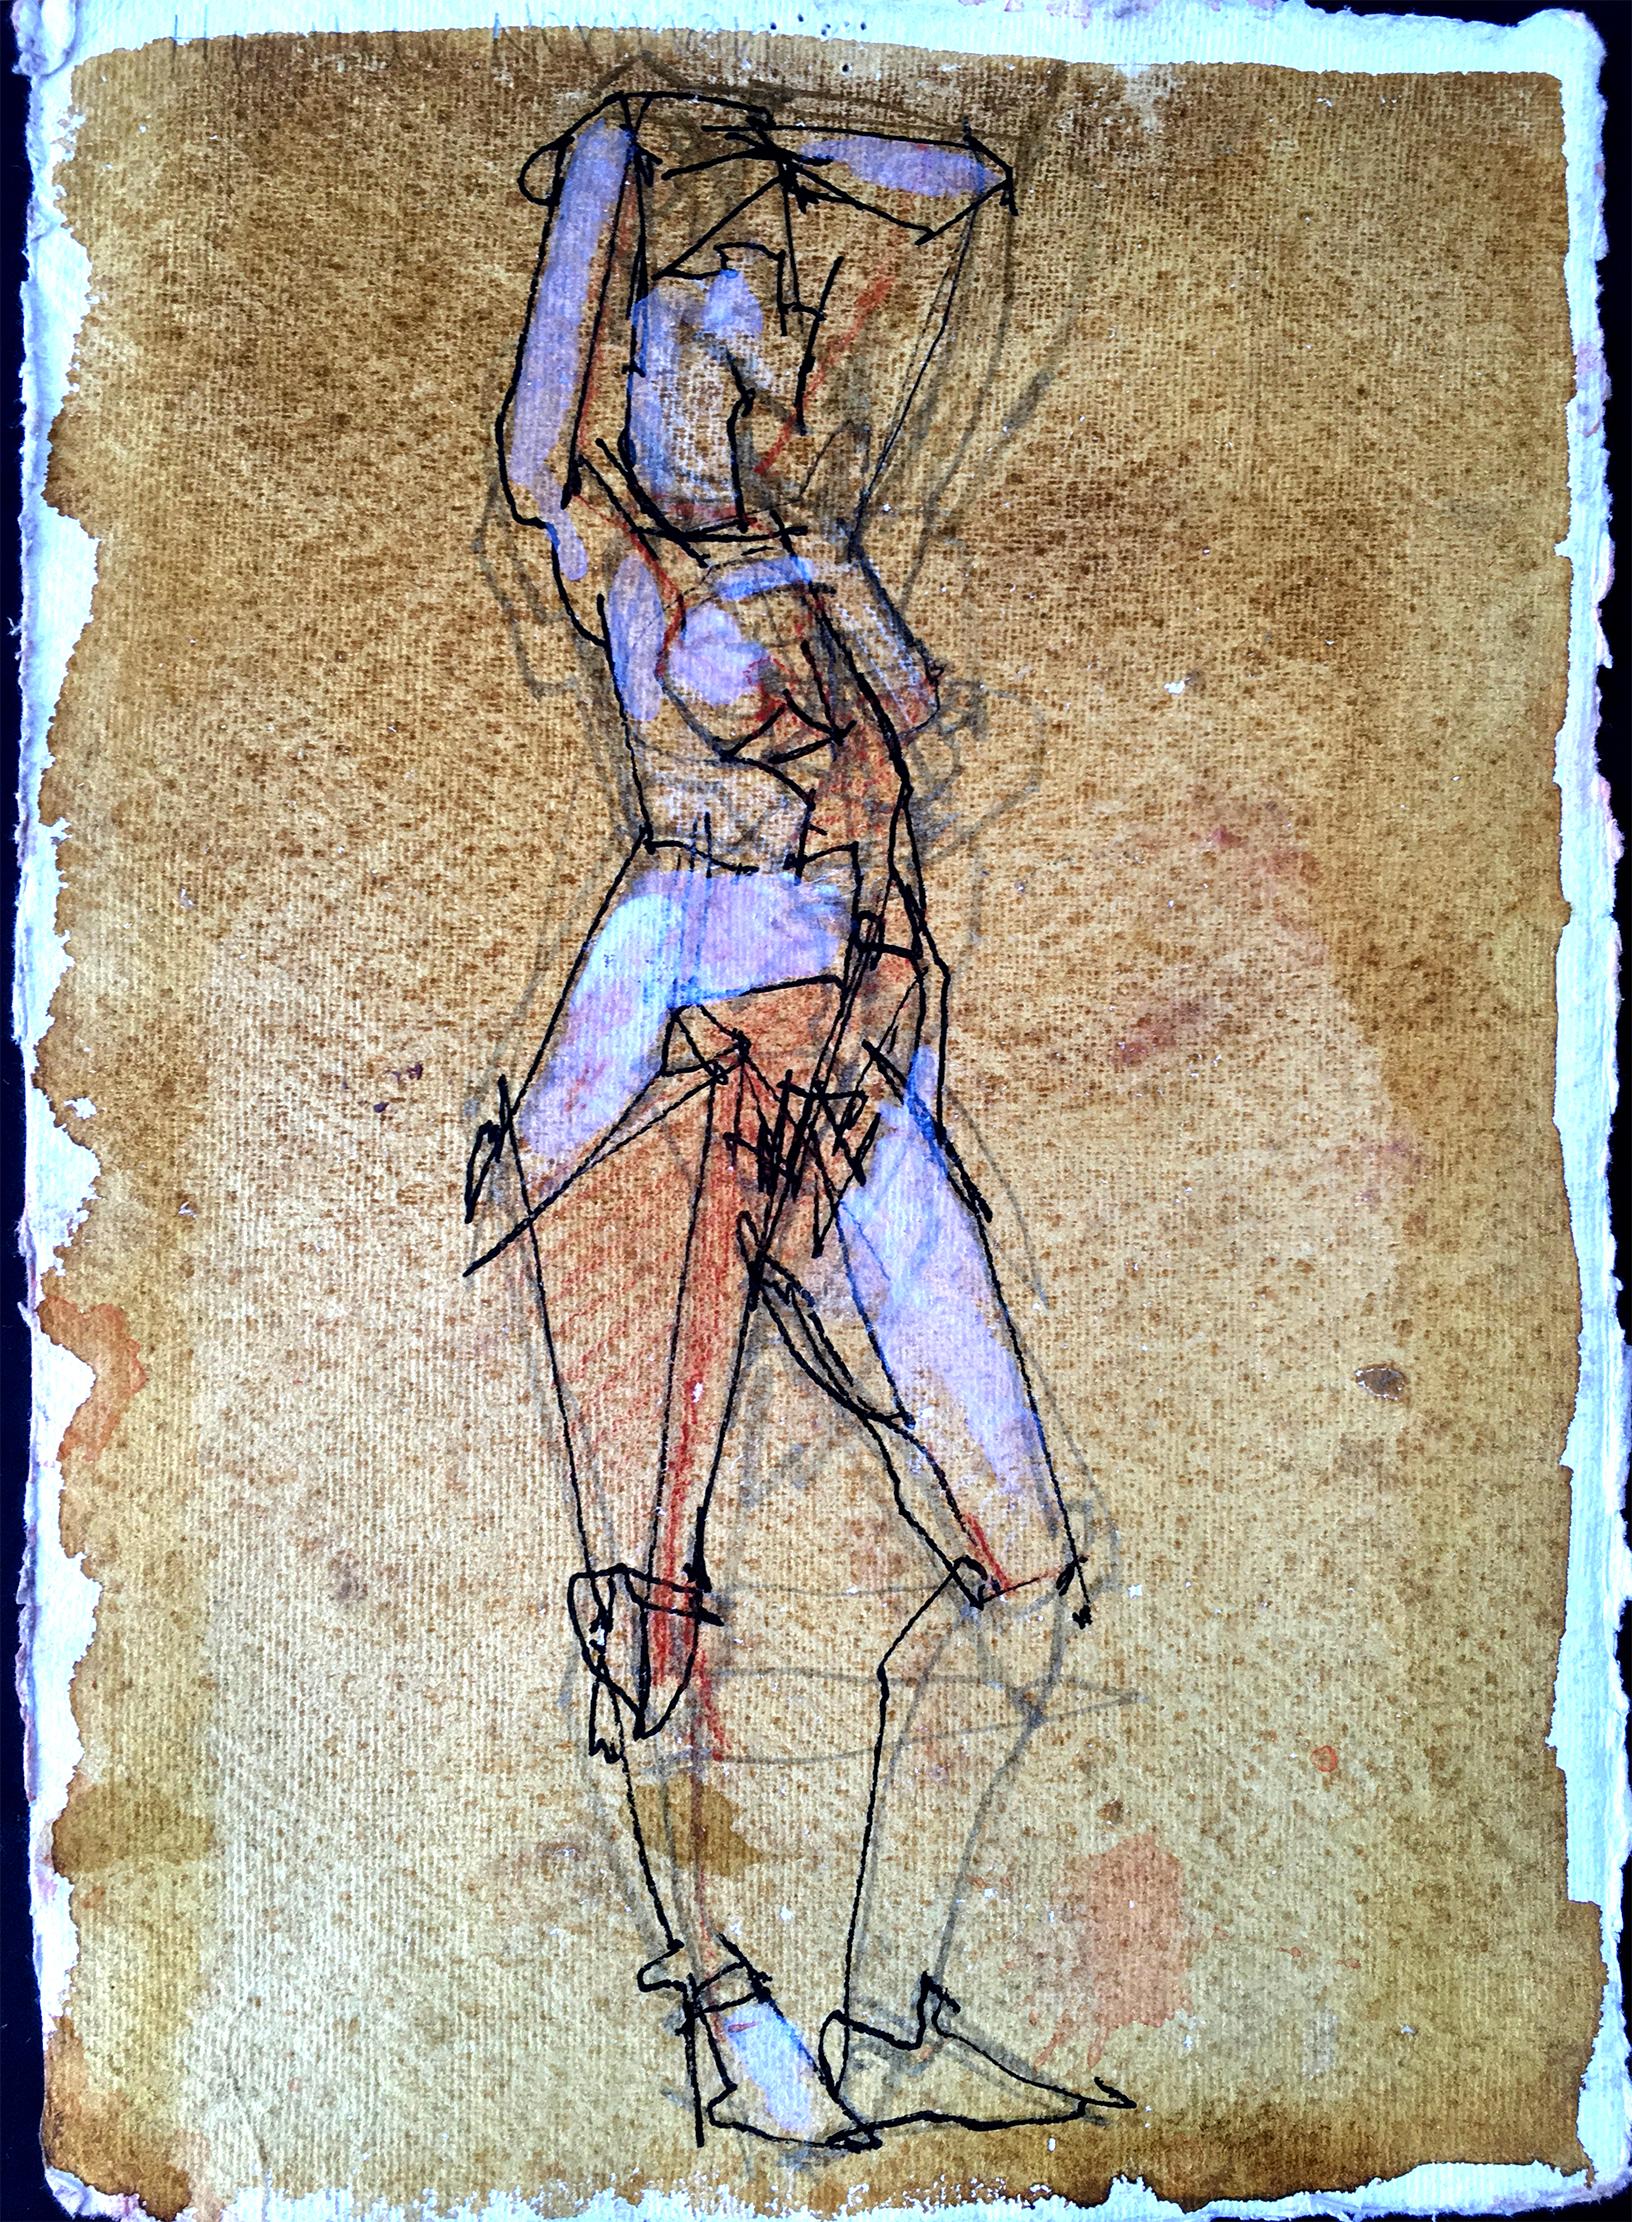 langley nude matrix 9x6 wc ink 2015.jpg